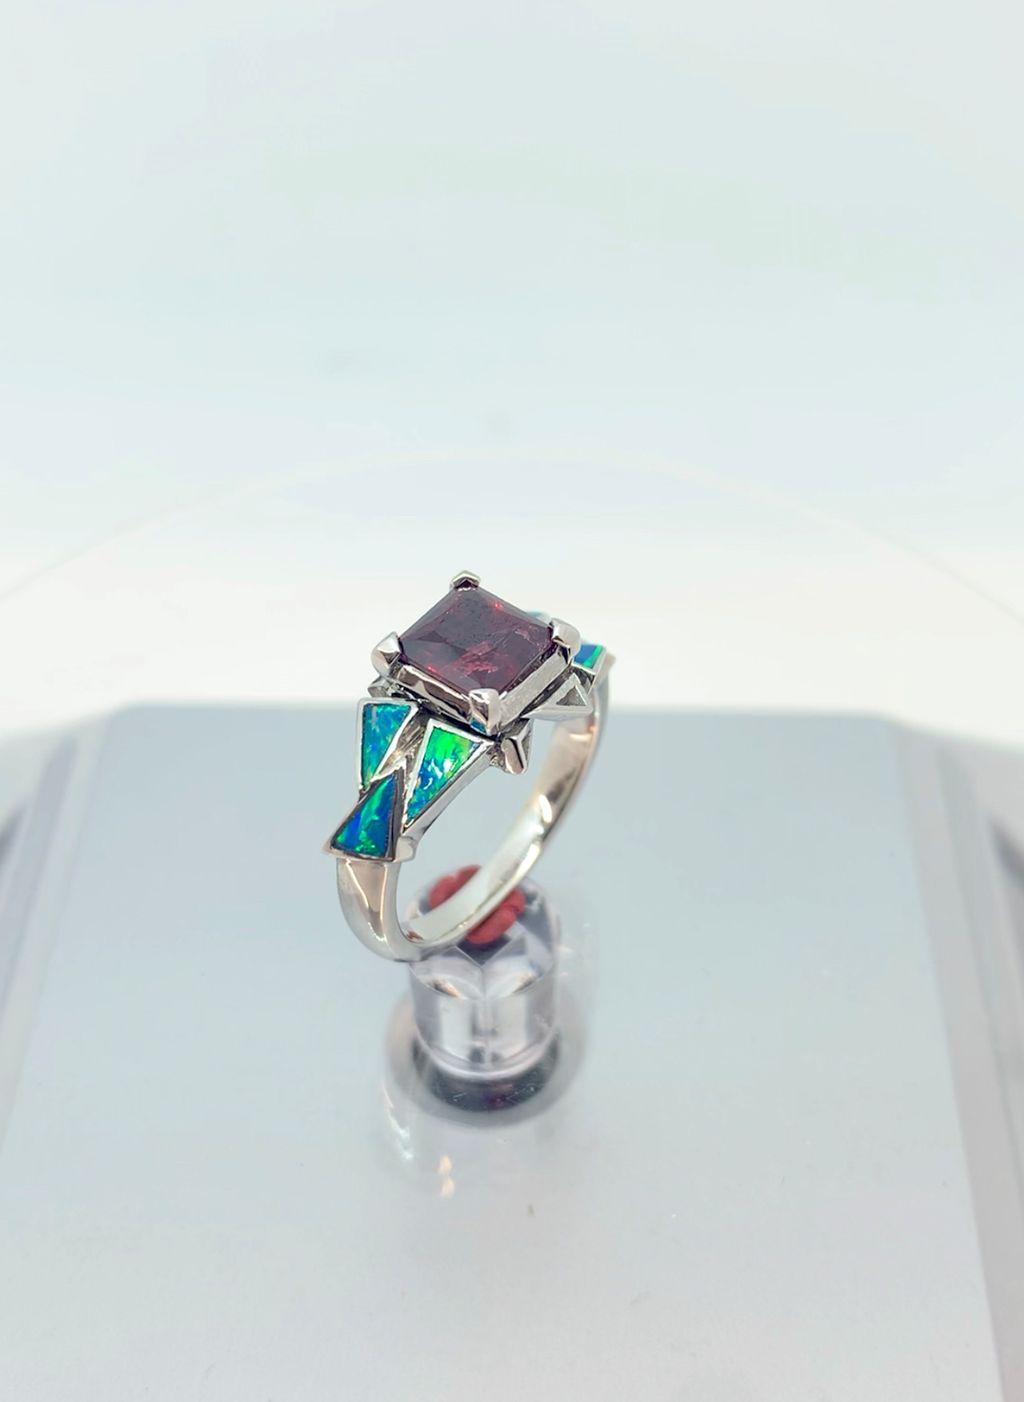 Princess-cut Garnet Ring with Opal Inlay